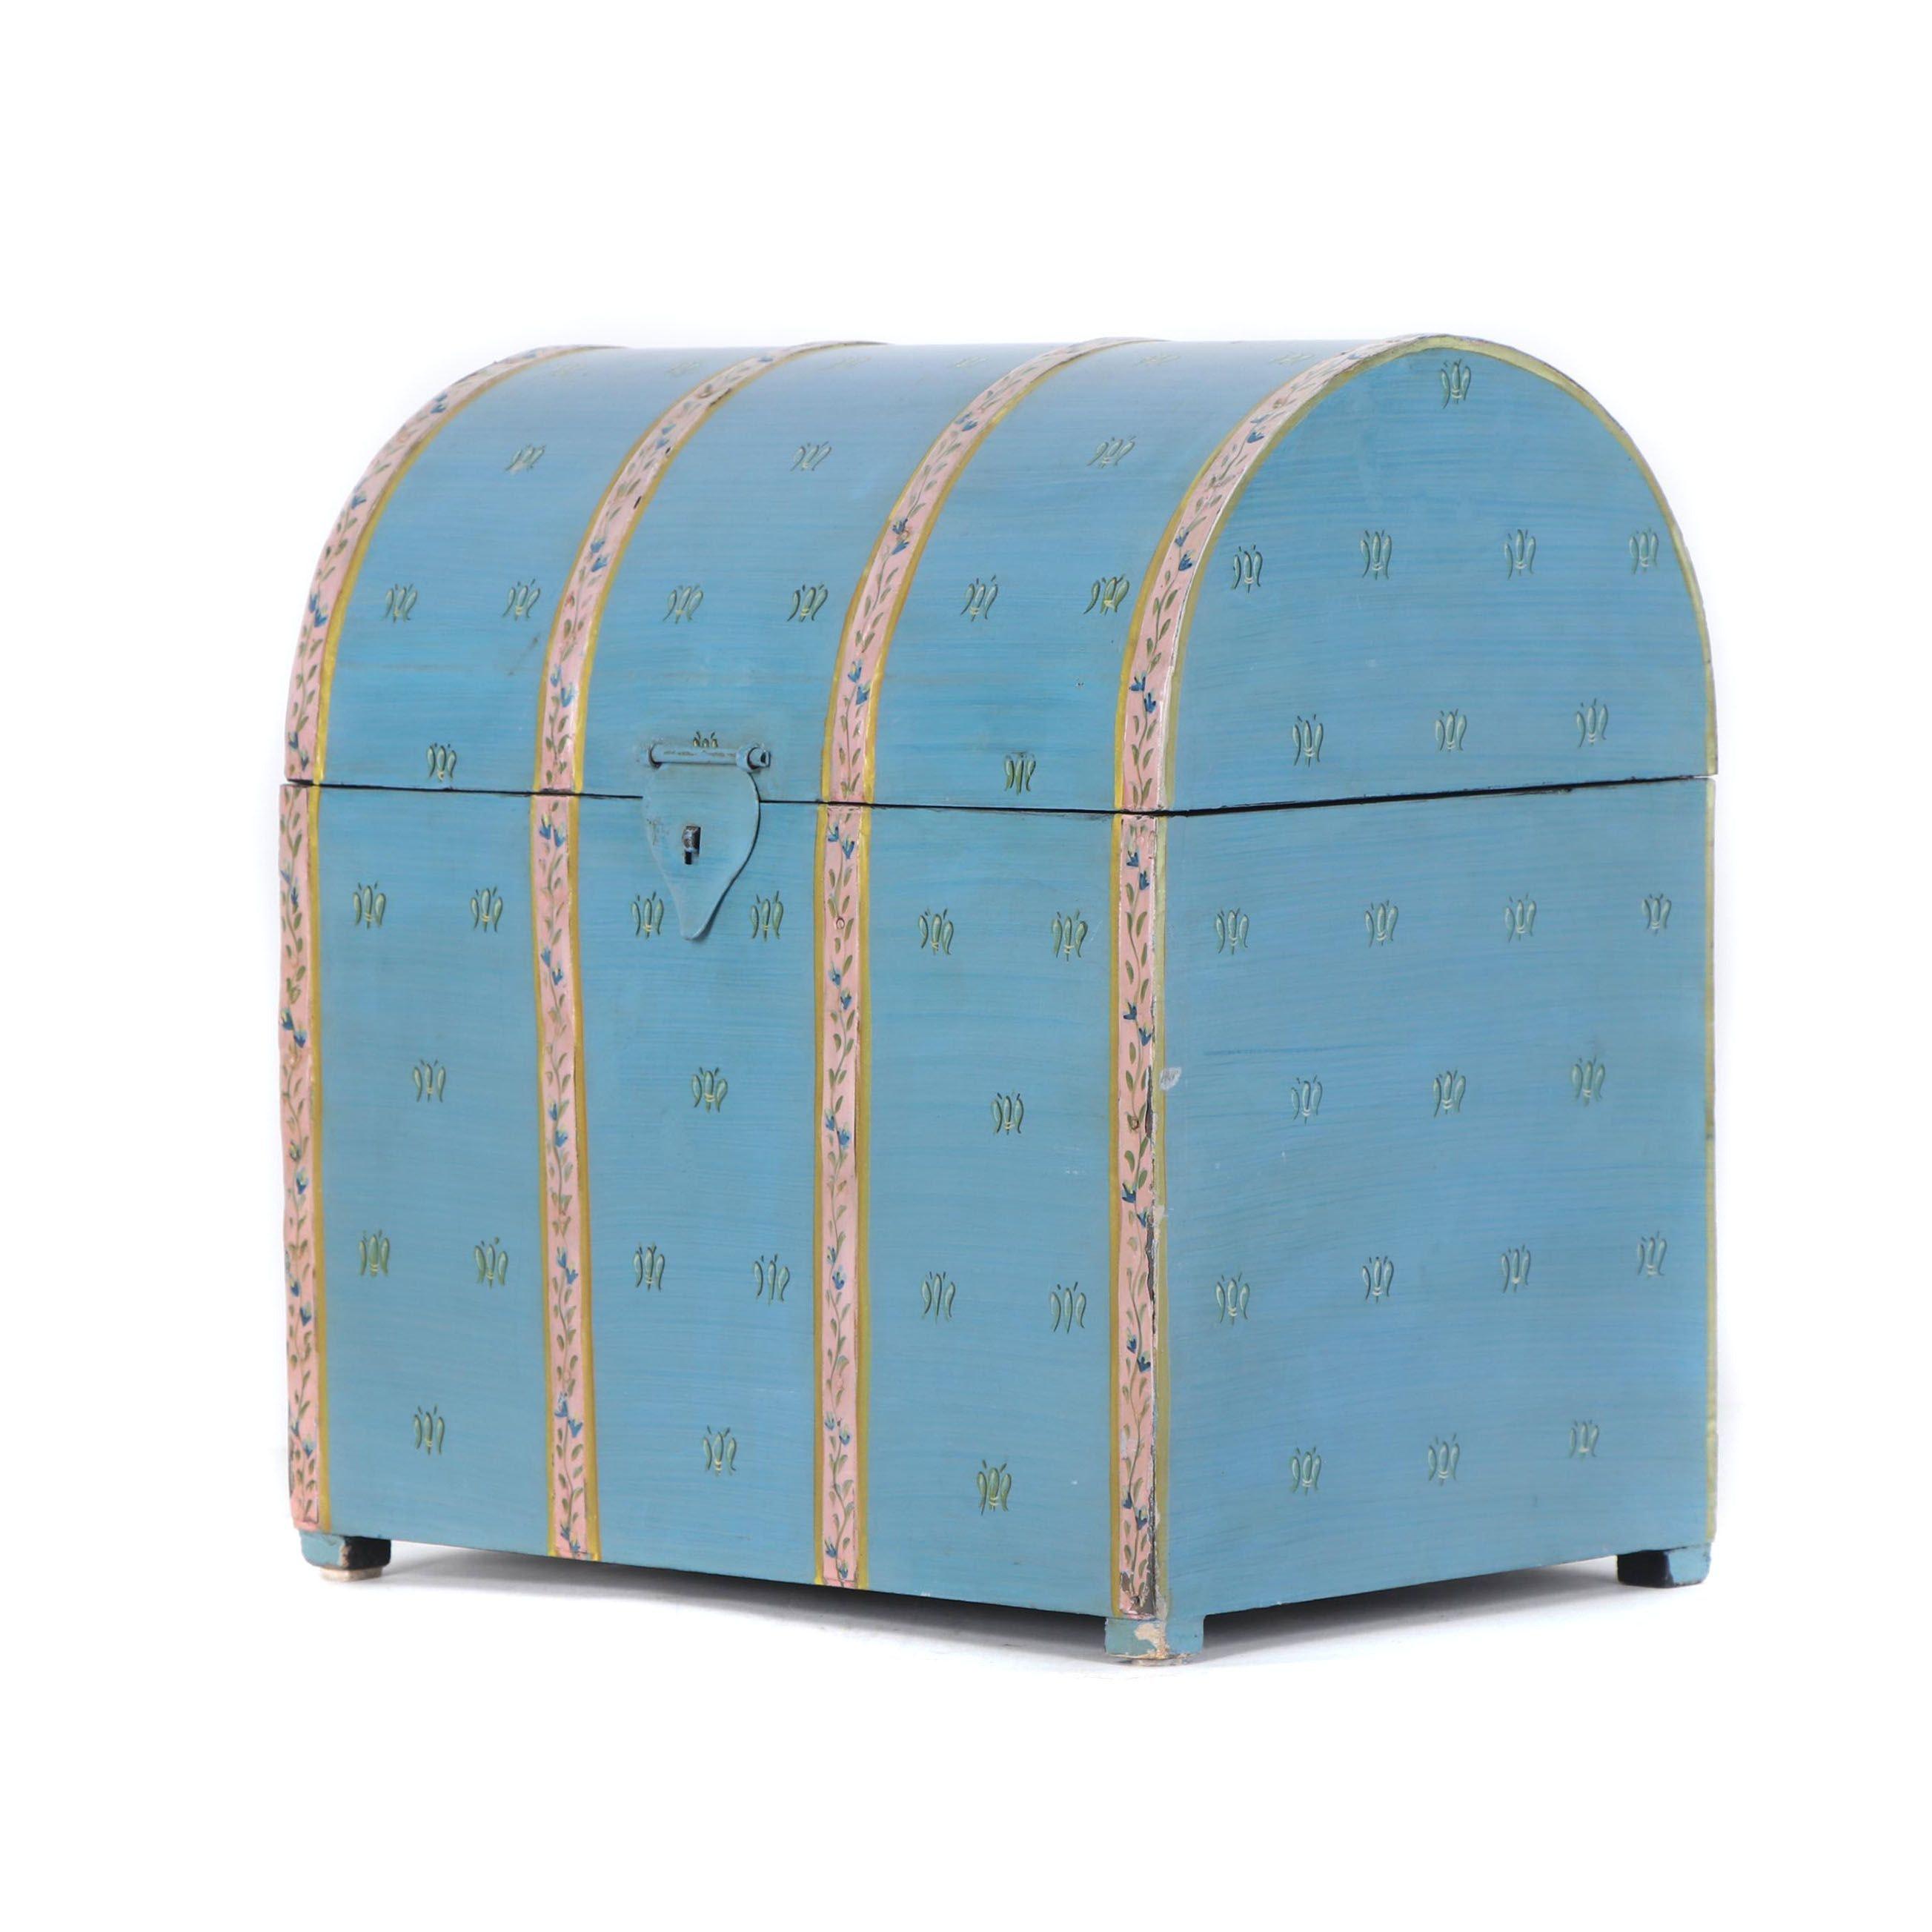 Decorative Hand-Painted Wine Storage Box